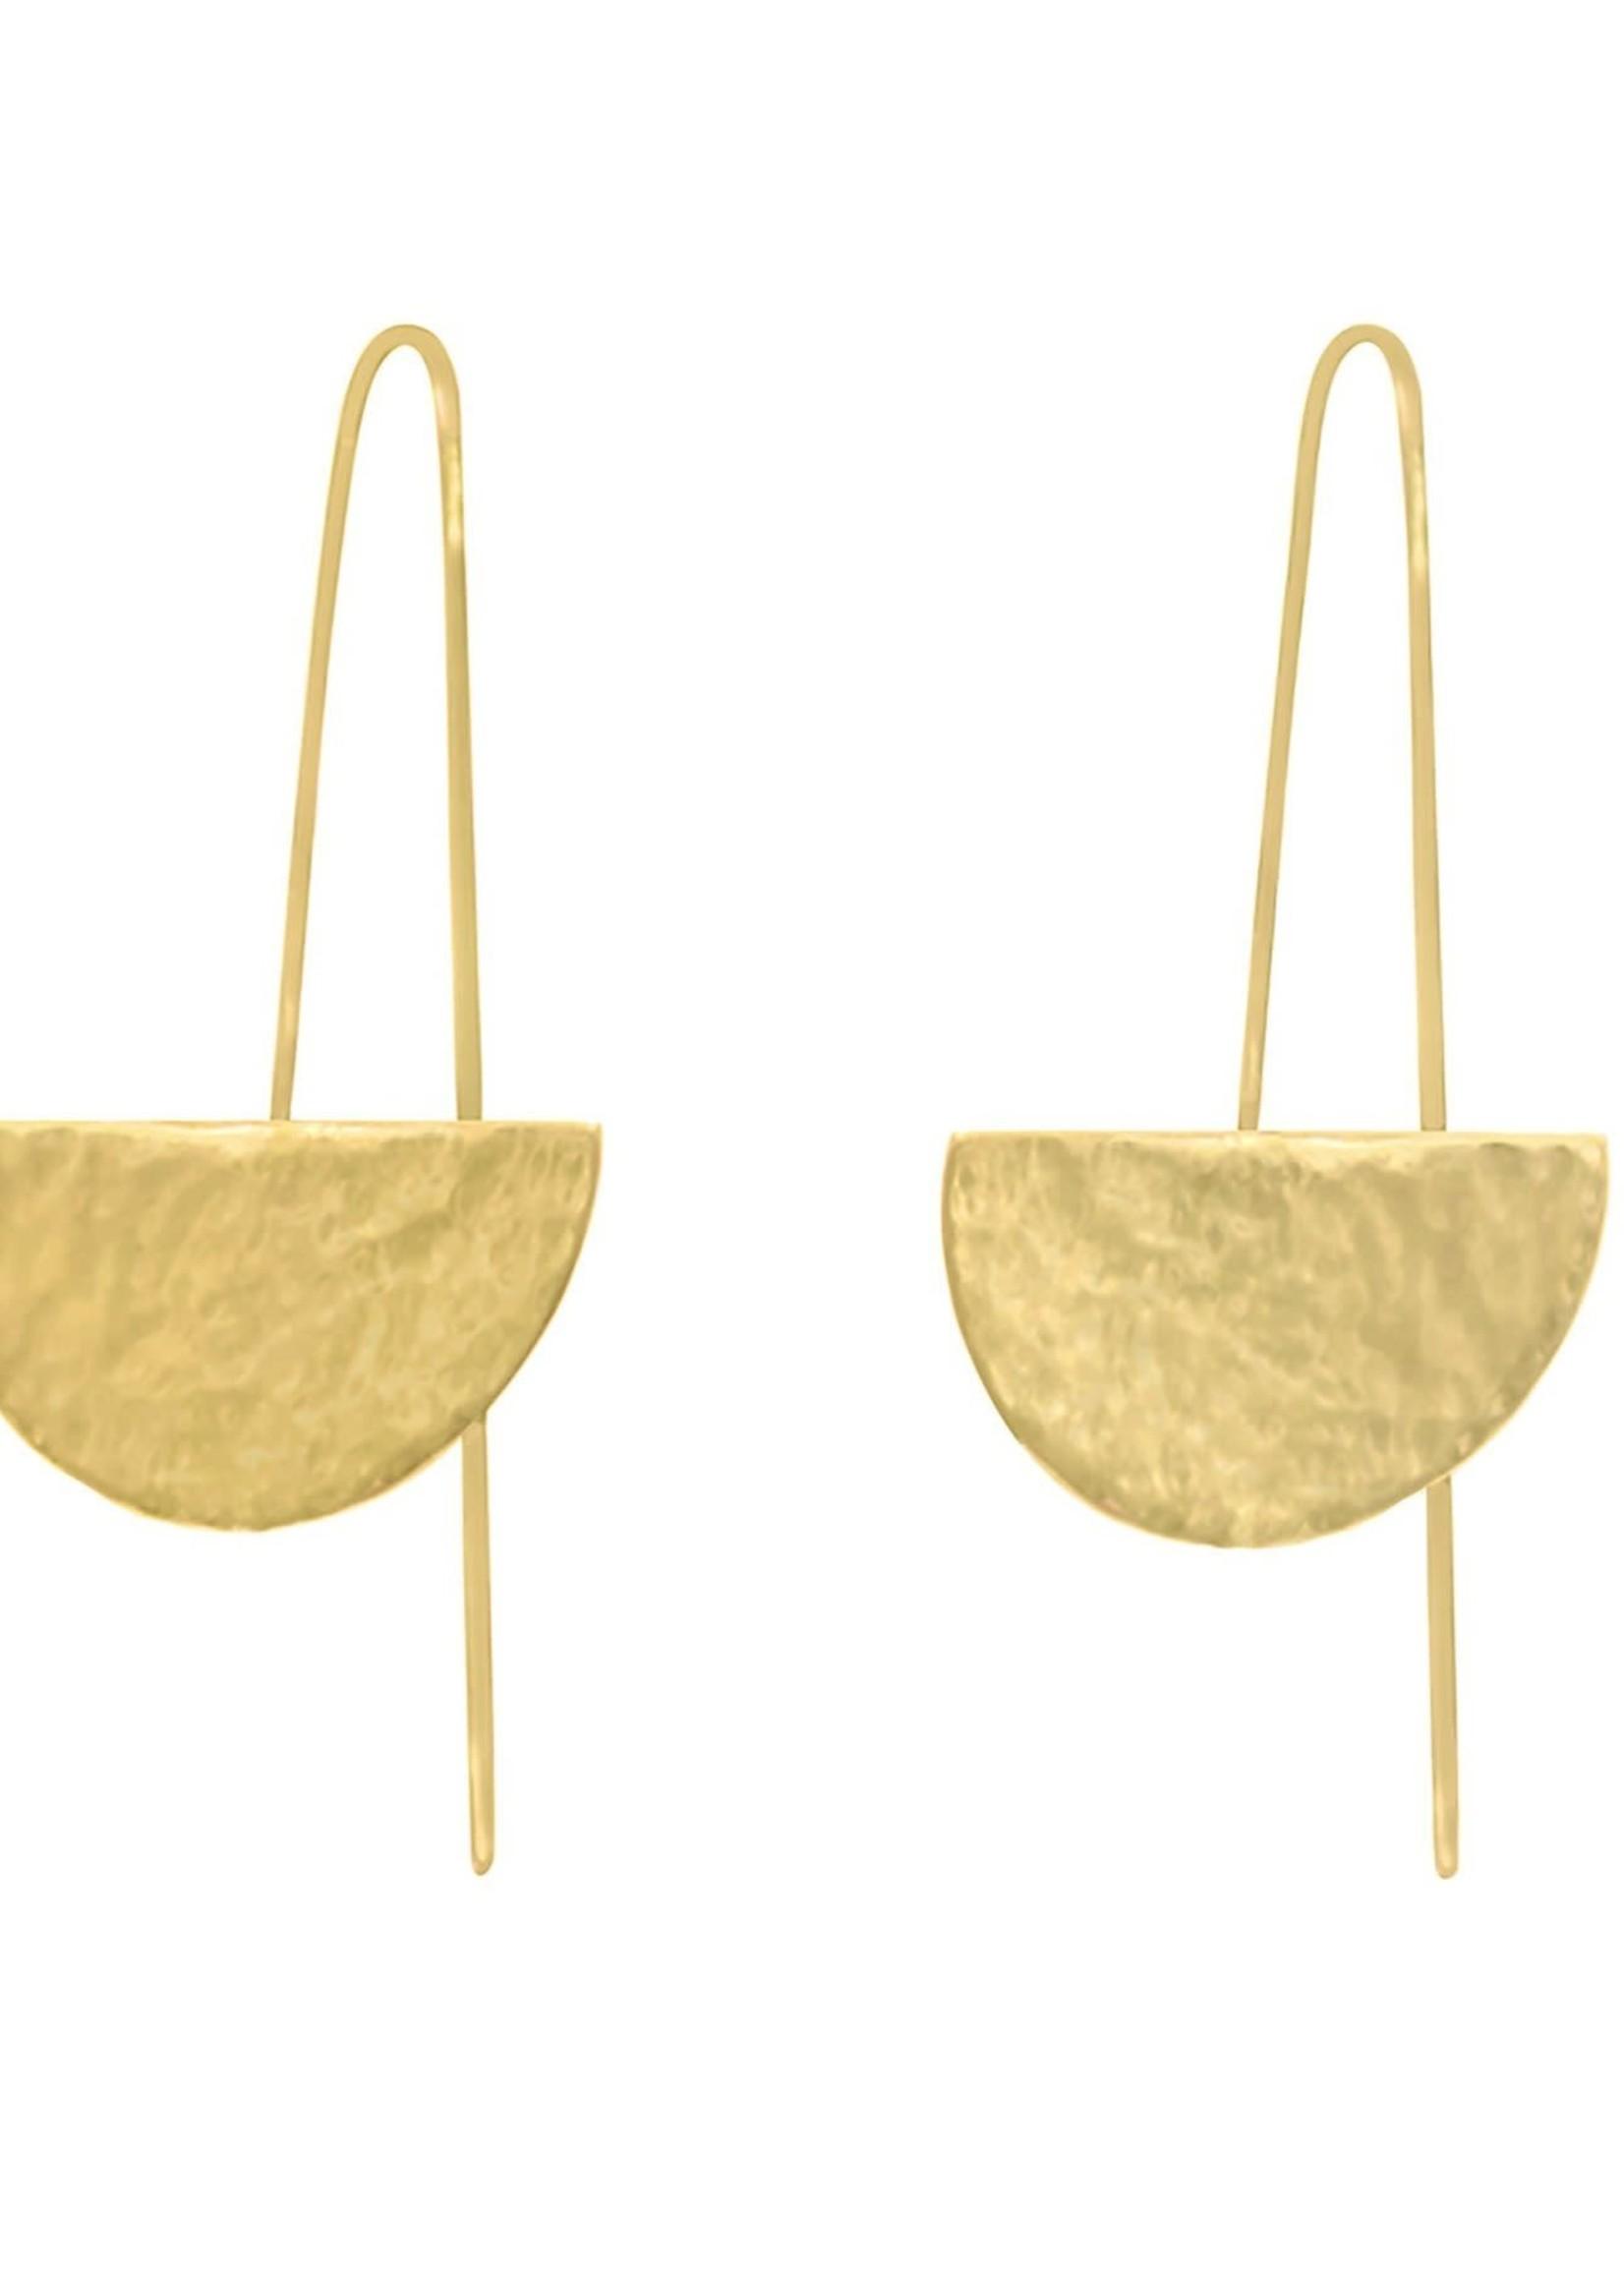 Purpose Jewelry Prima Threader Earrings